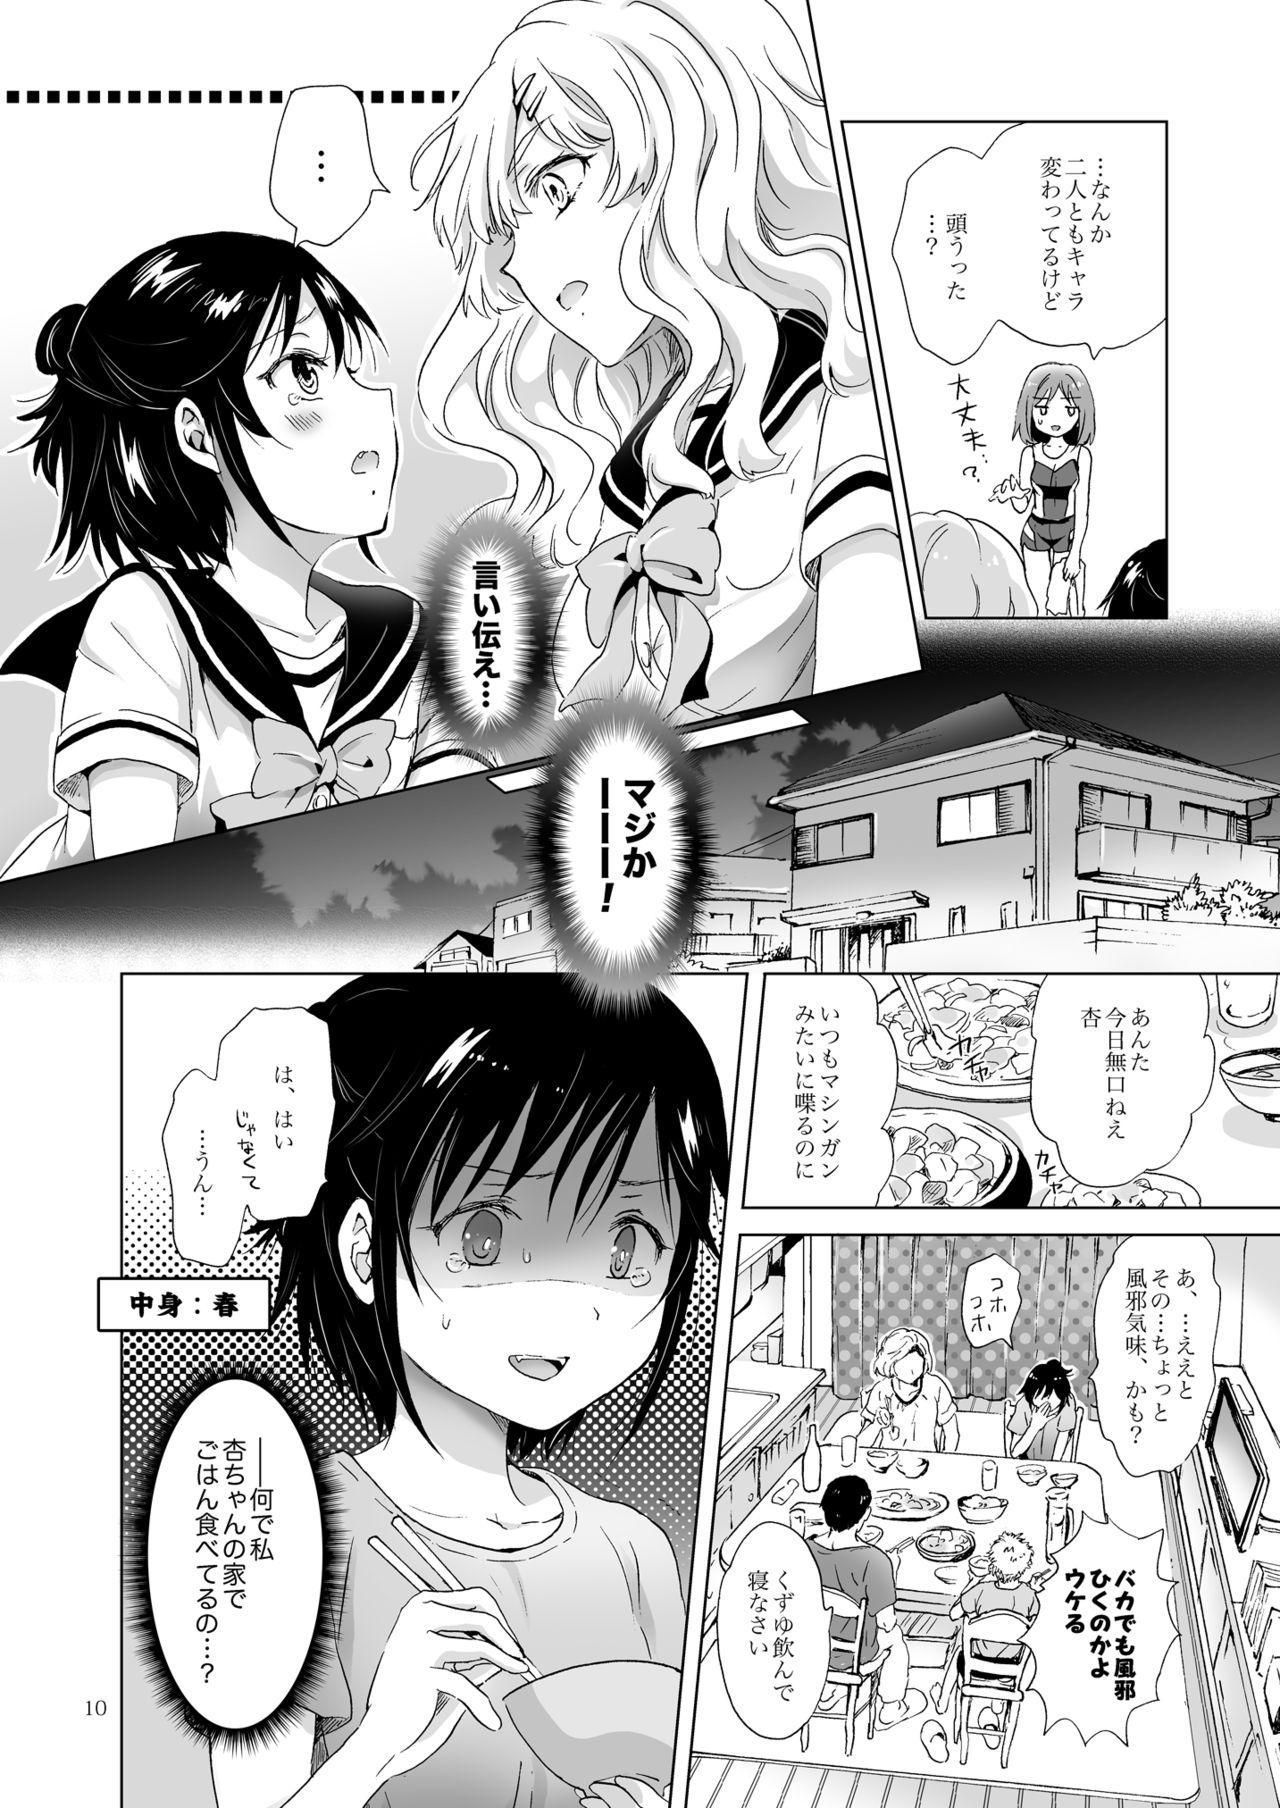 [peachpulsar (Mira)] Oppai-chan to chippai-chan ga irekawaru hanashi [Digital] 8